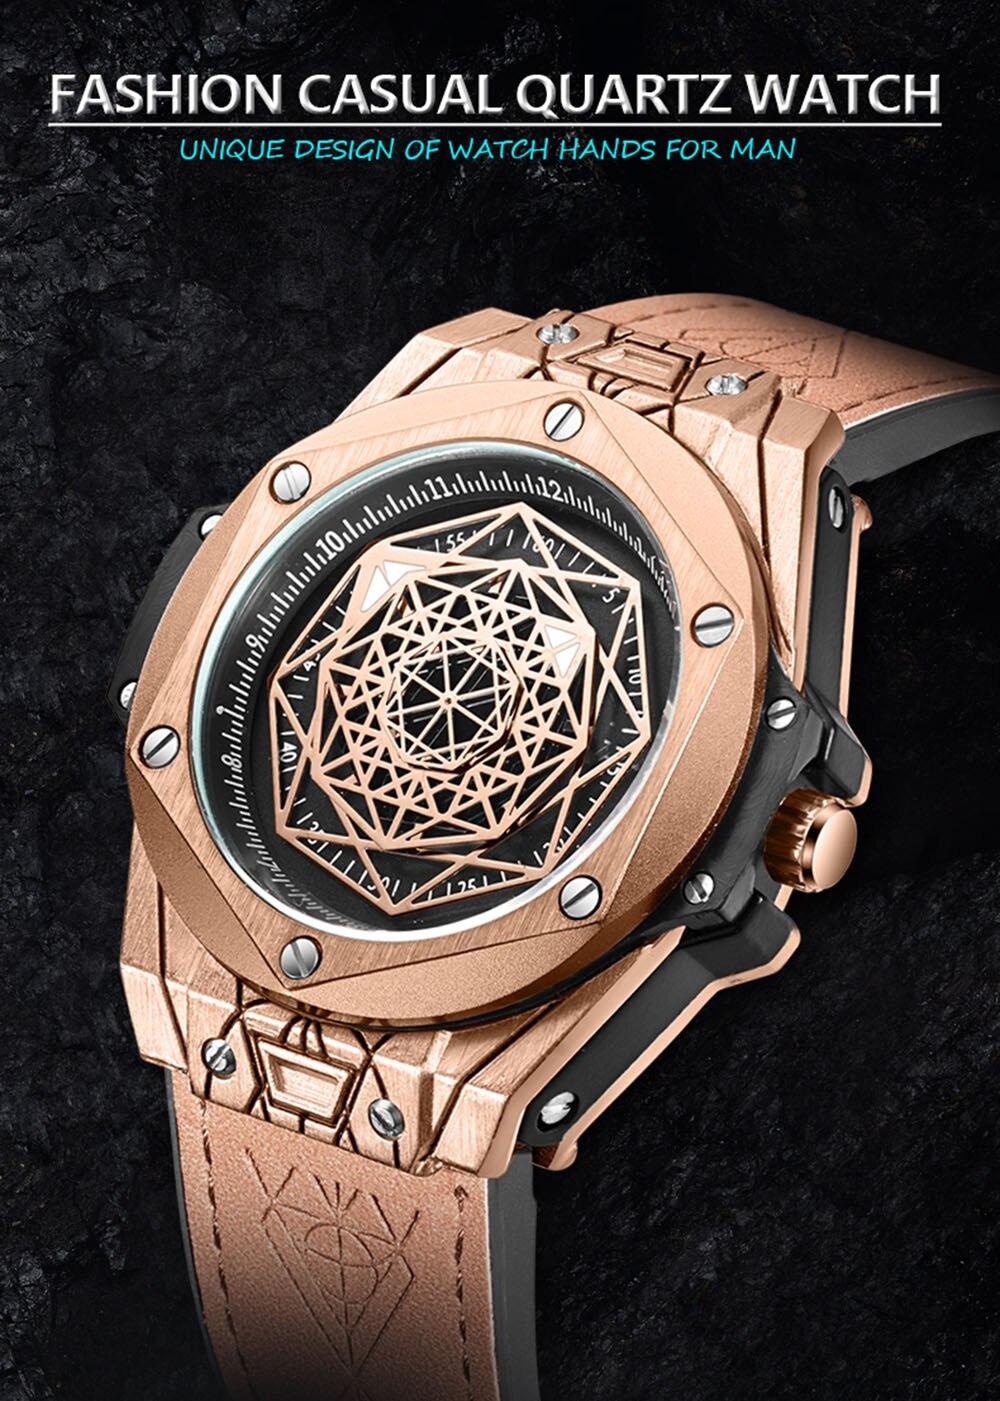 ONOLA brand fashion cusual quartz watch men 2019 new unusual unique waterproof wrist watch male style designer relogio masculino